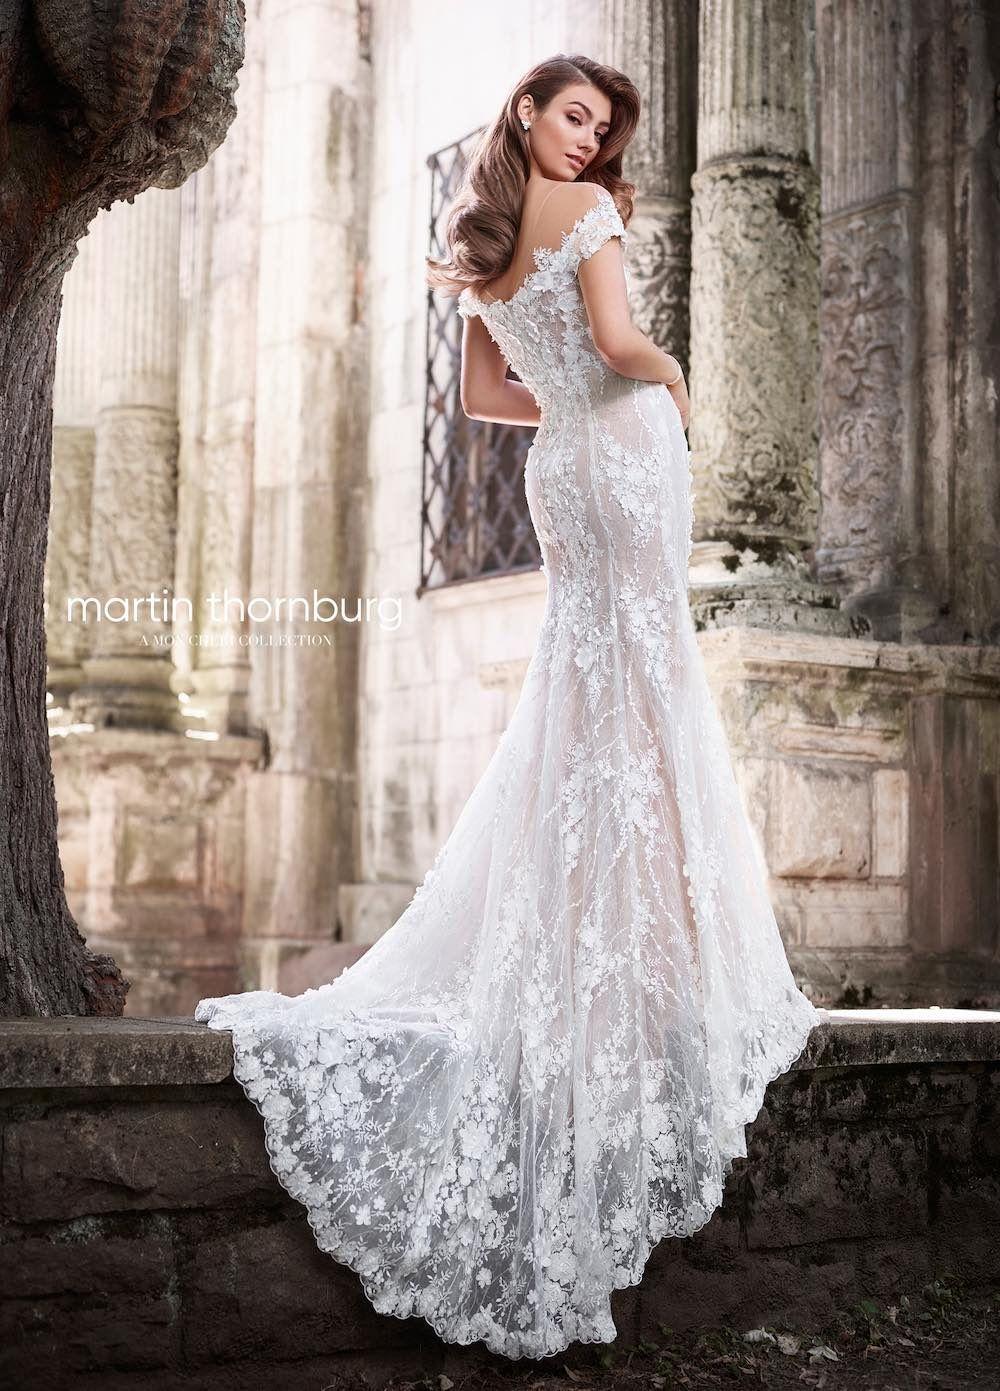 Best wedding dresses for short waisted  Wedding Dress Inspiration  Martin Thornburg from Mon Cheri Bridals